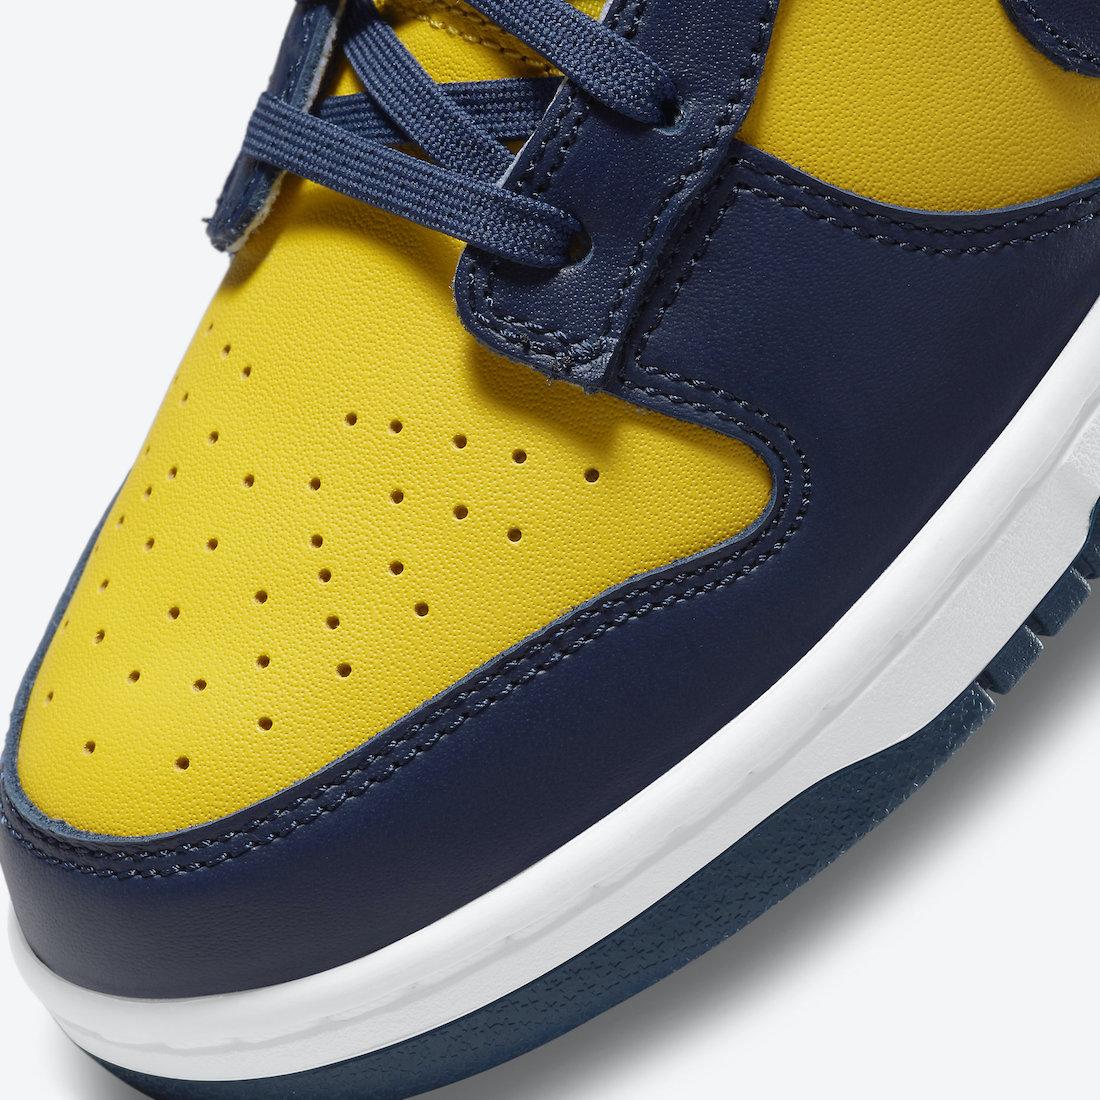 Nike-Dunk-Low-Michigan-DD1391-700-Release-Date-Price-6